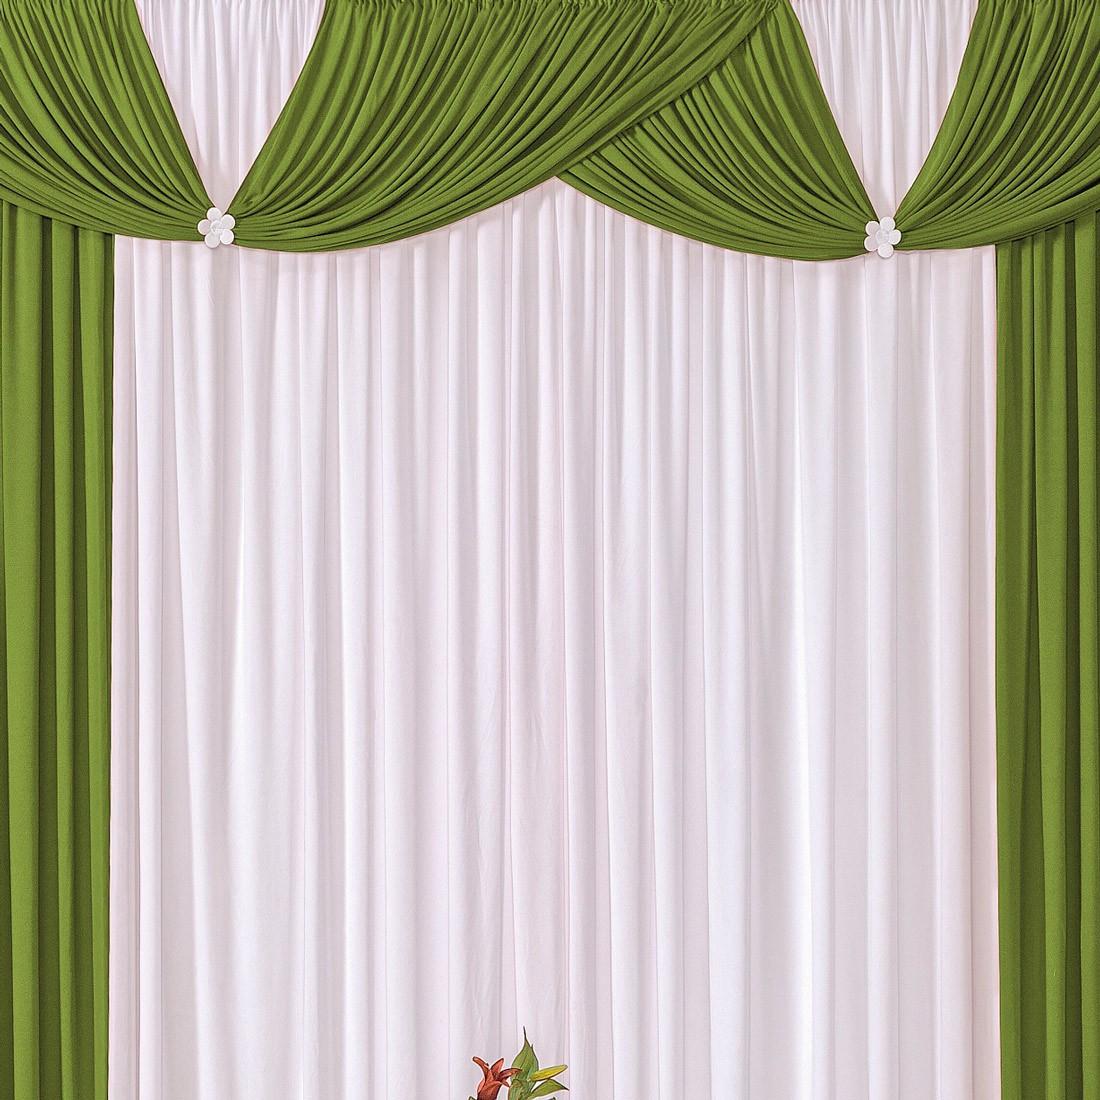 Cortina Londrina Verde/Branco 4,00m X 2,60m p/ Varão Simples